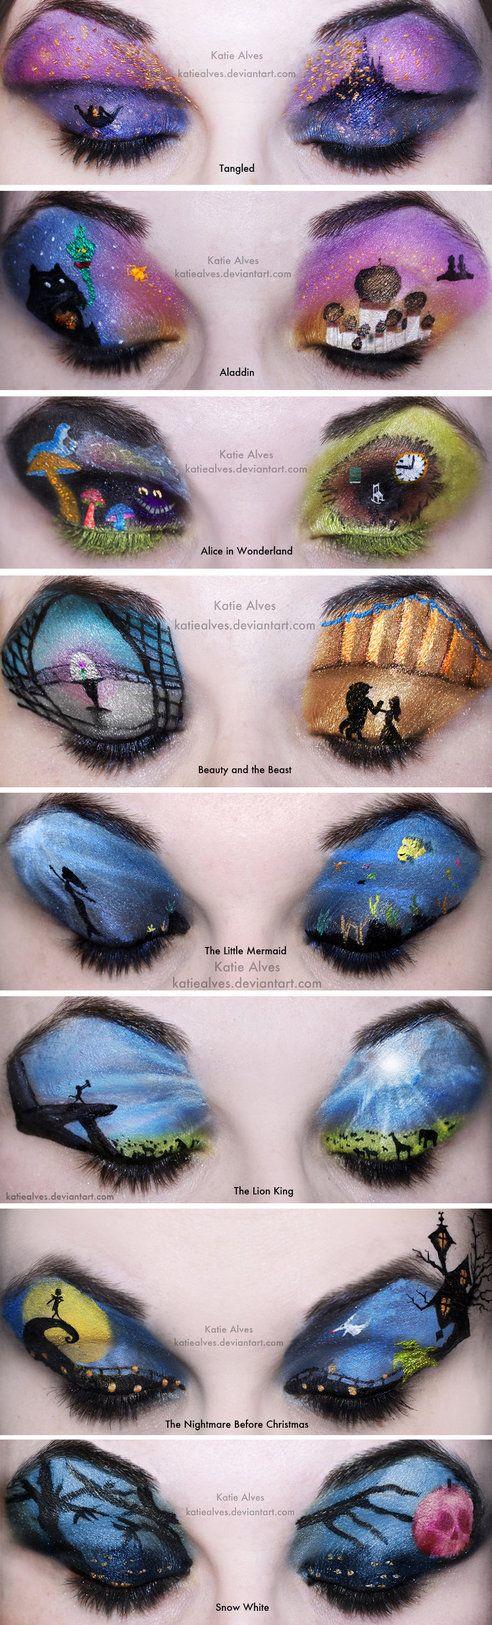 Disney Make-up Collection  #Sarah Forehand